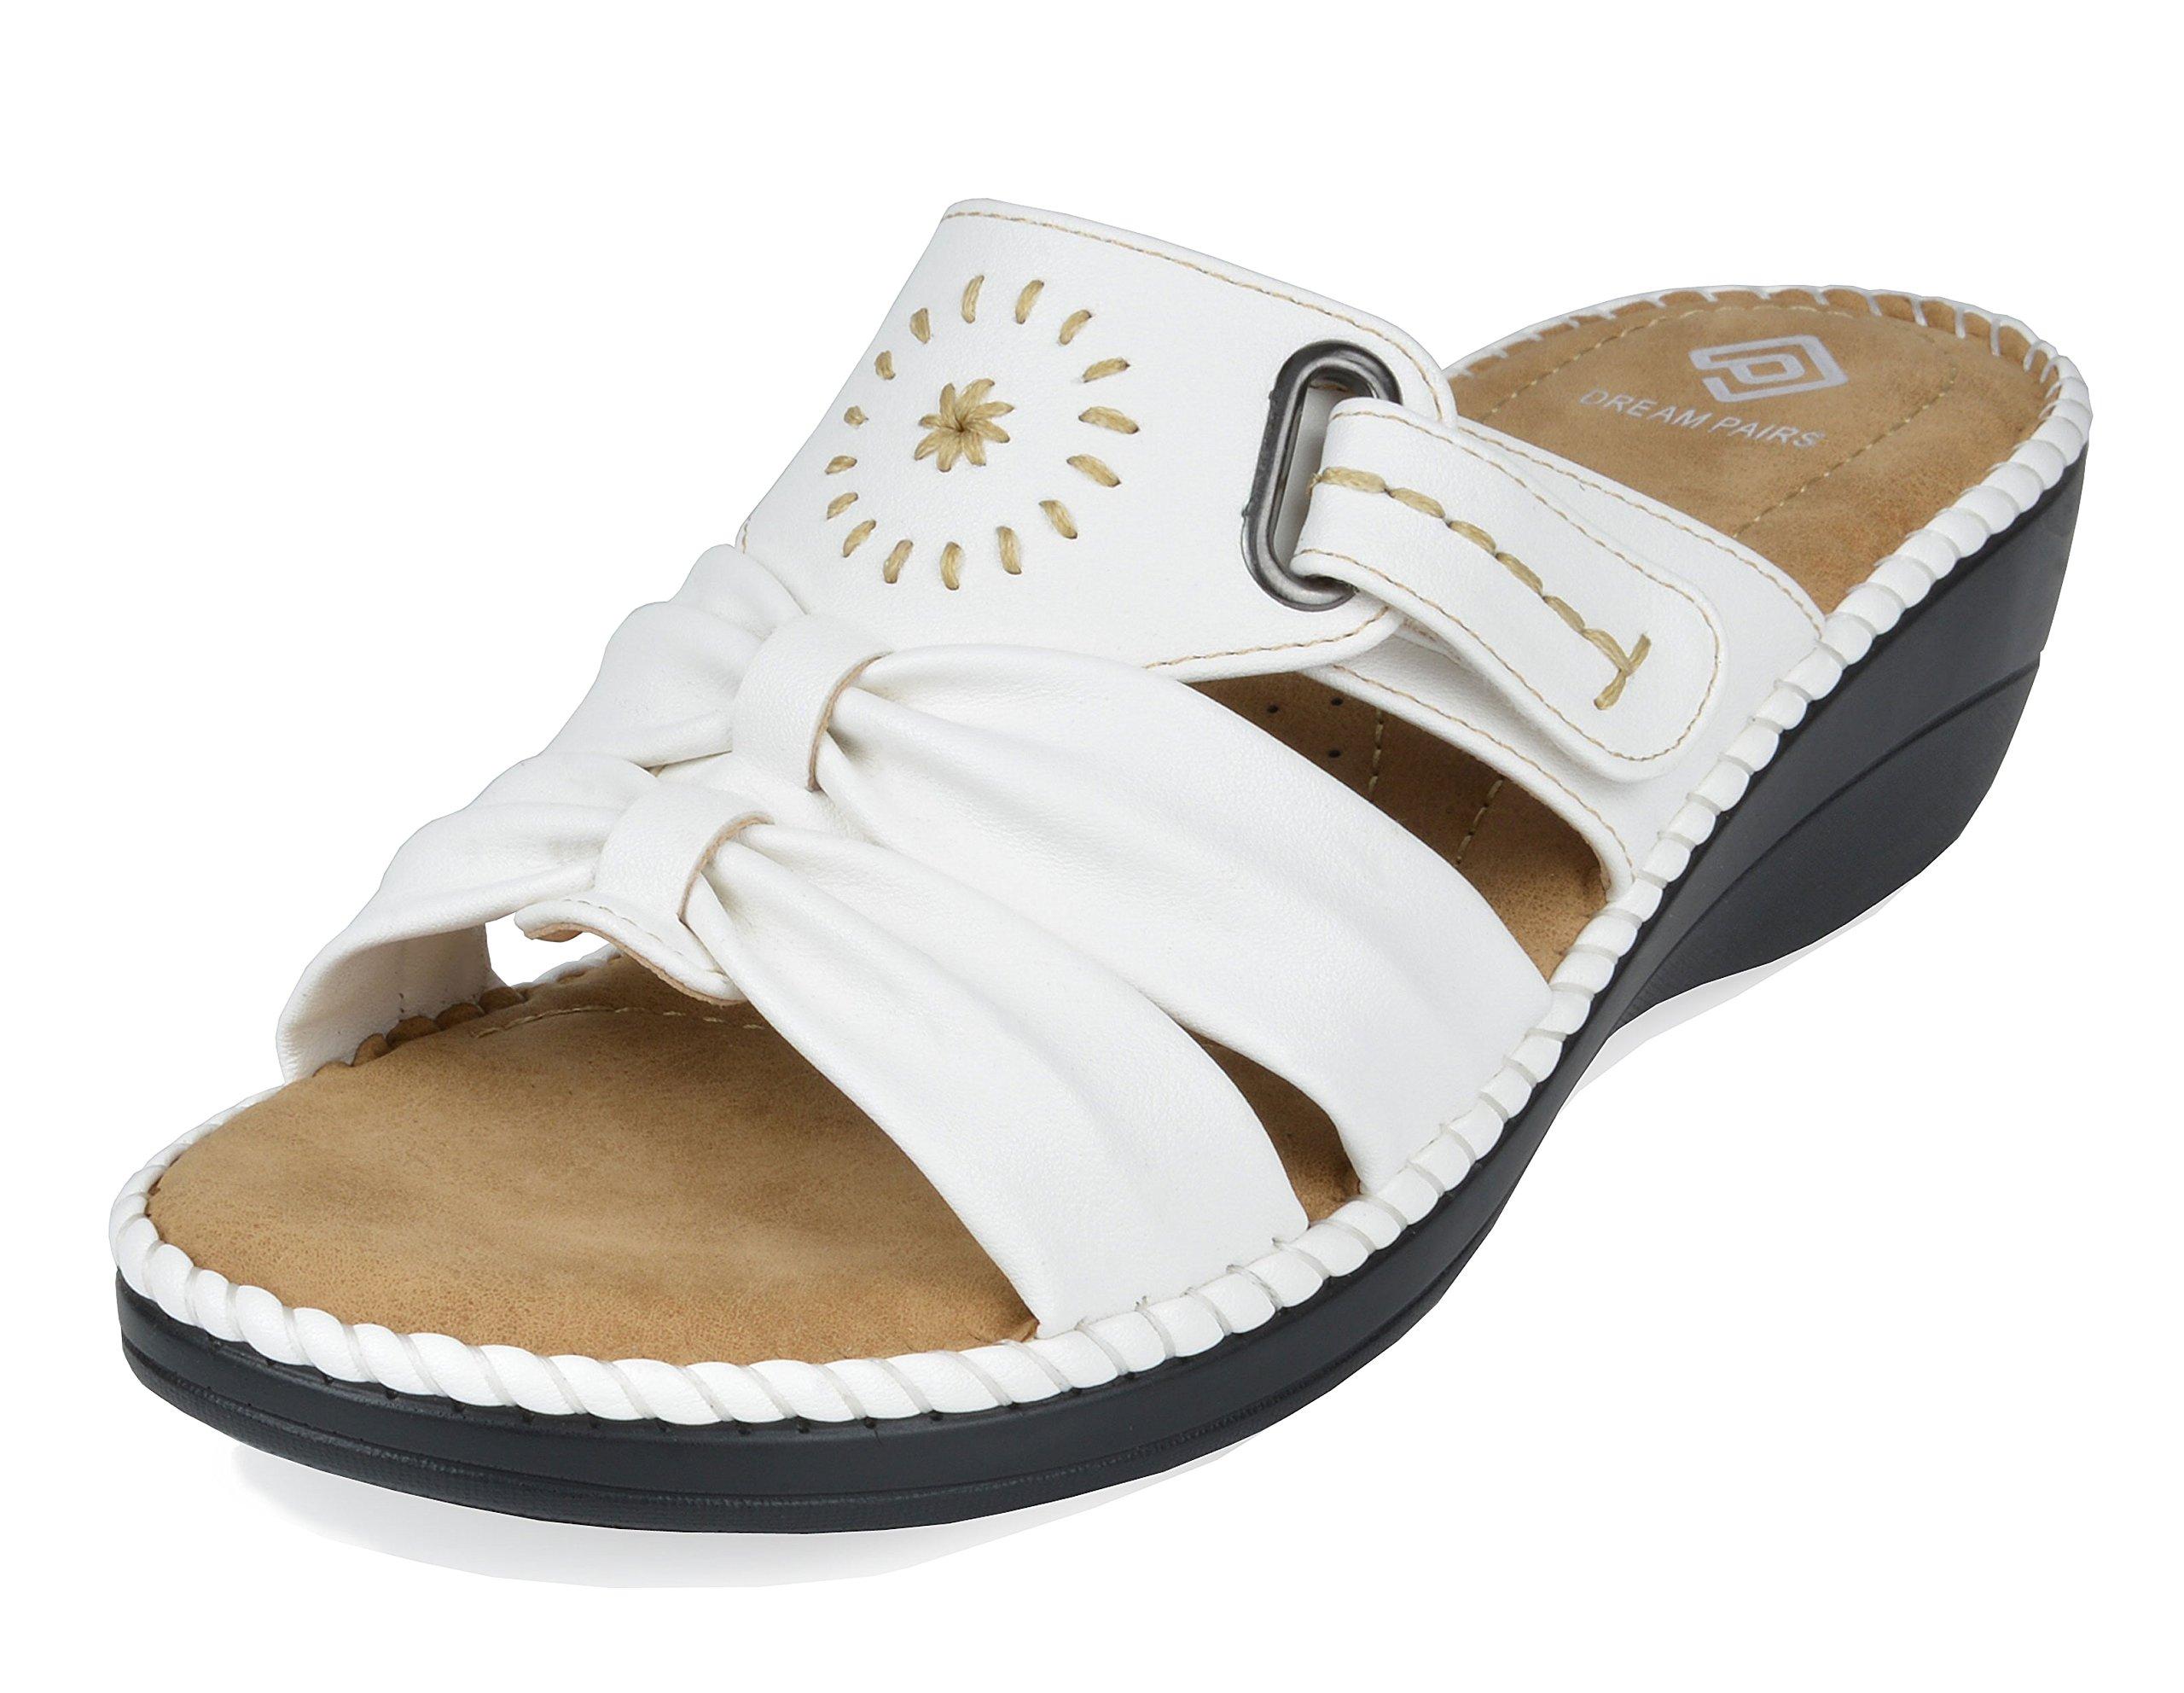 DREAM PAIRS Women's Truesoft_08 White Low Platform Wedges Slides Sandals Size 7.5 B(M) US